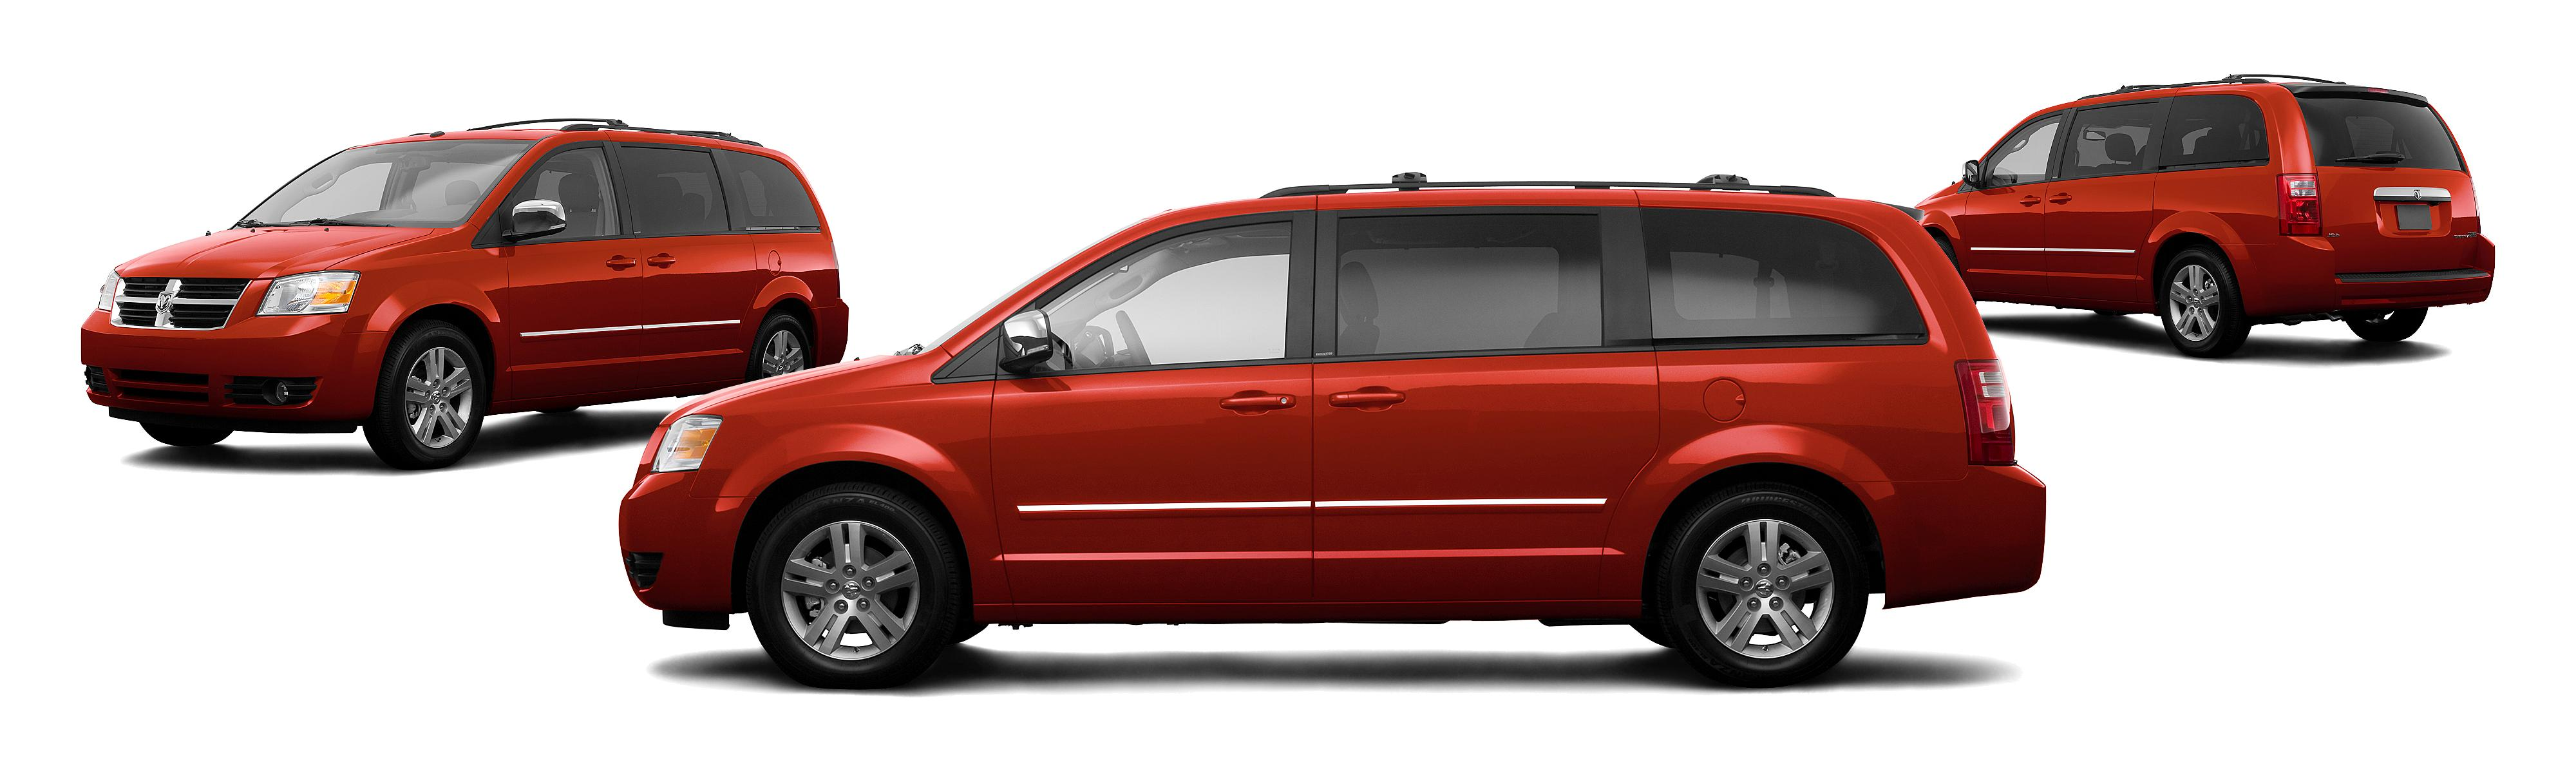 2008 Dodge Grand Caravan Sxt Extended 4dr Mini Van Research Groovecar